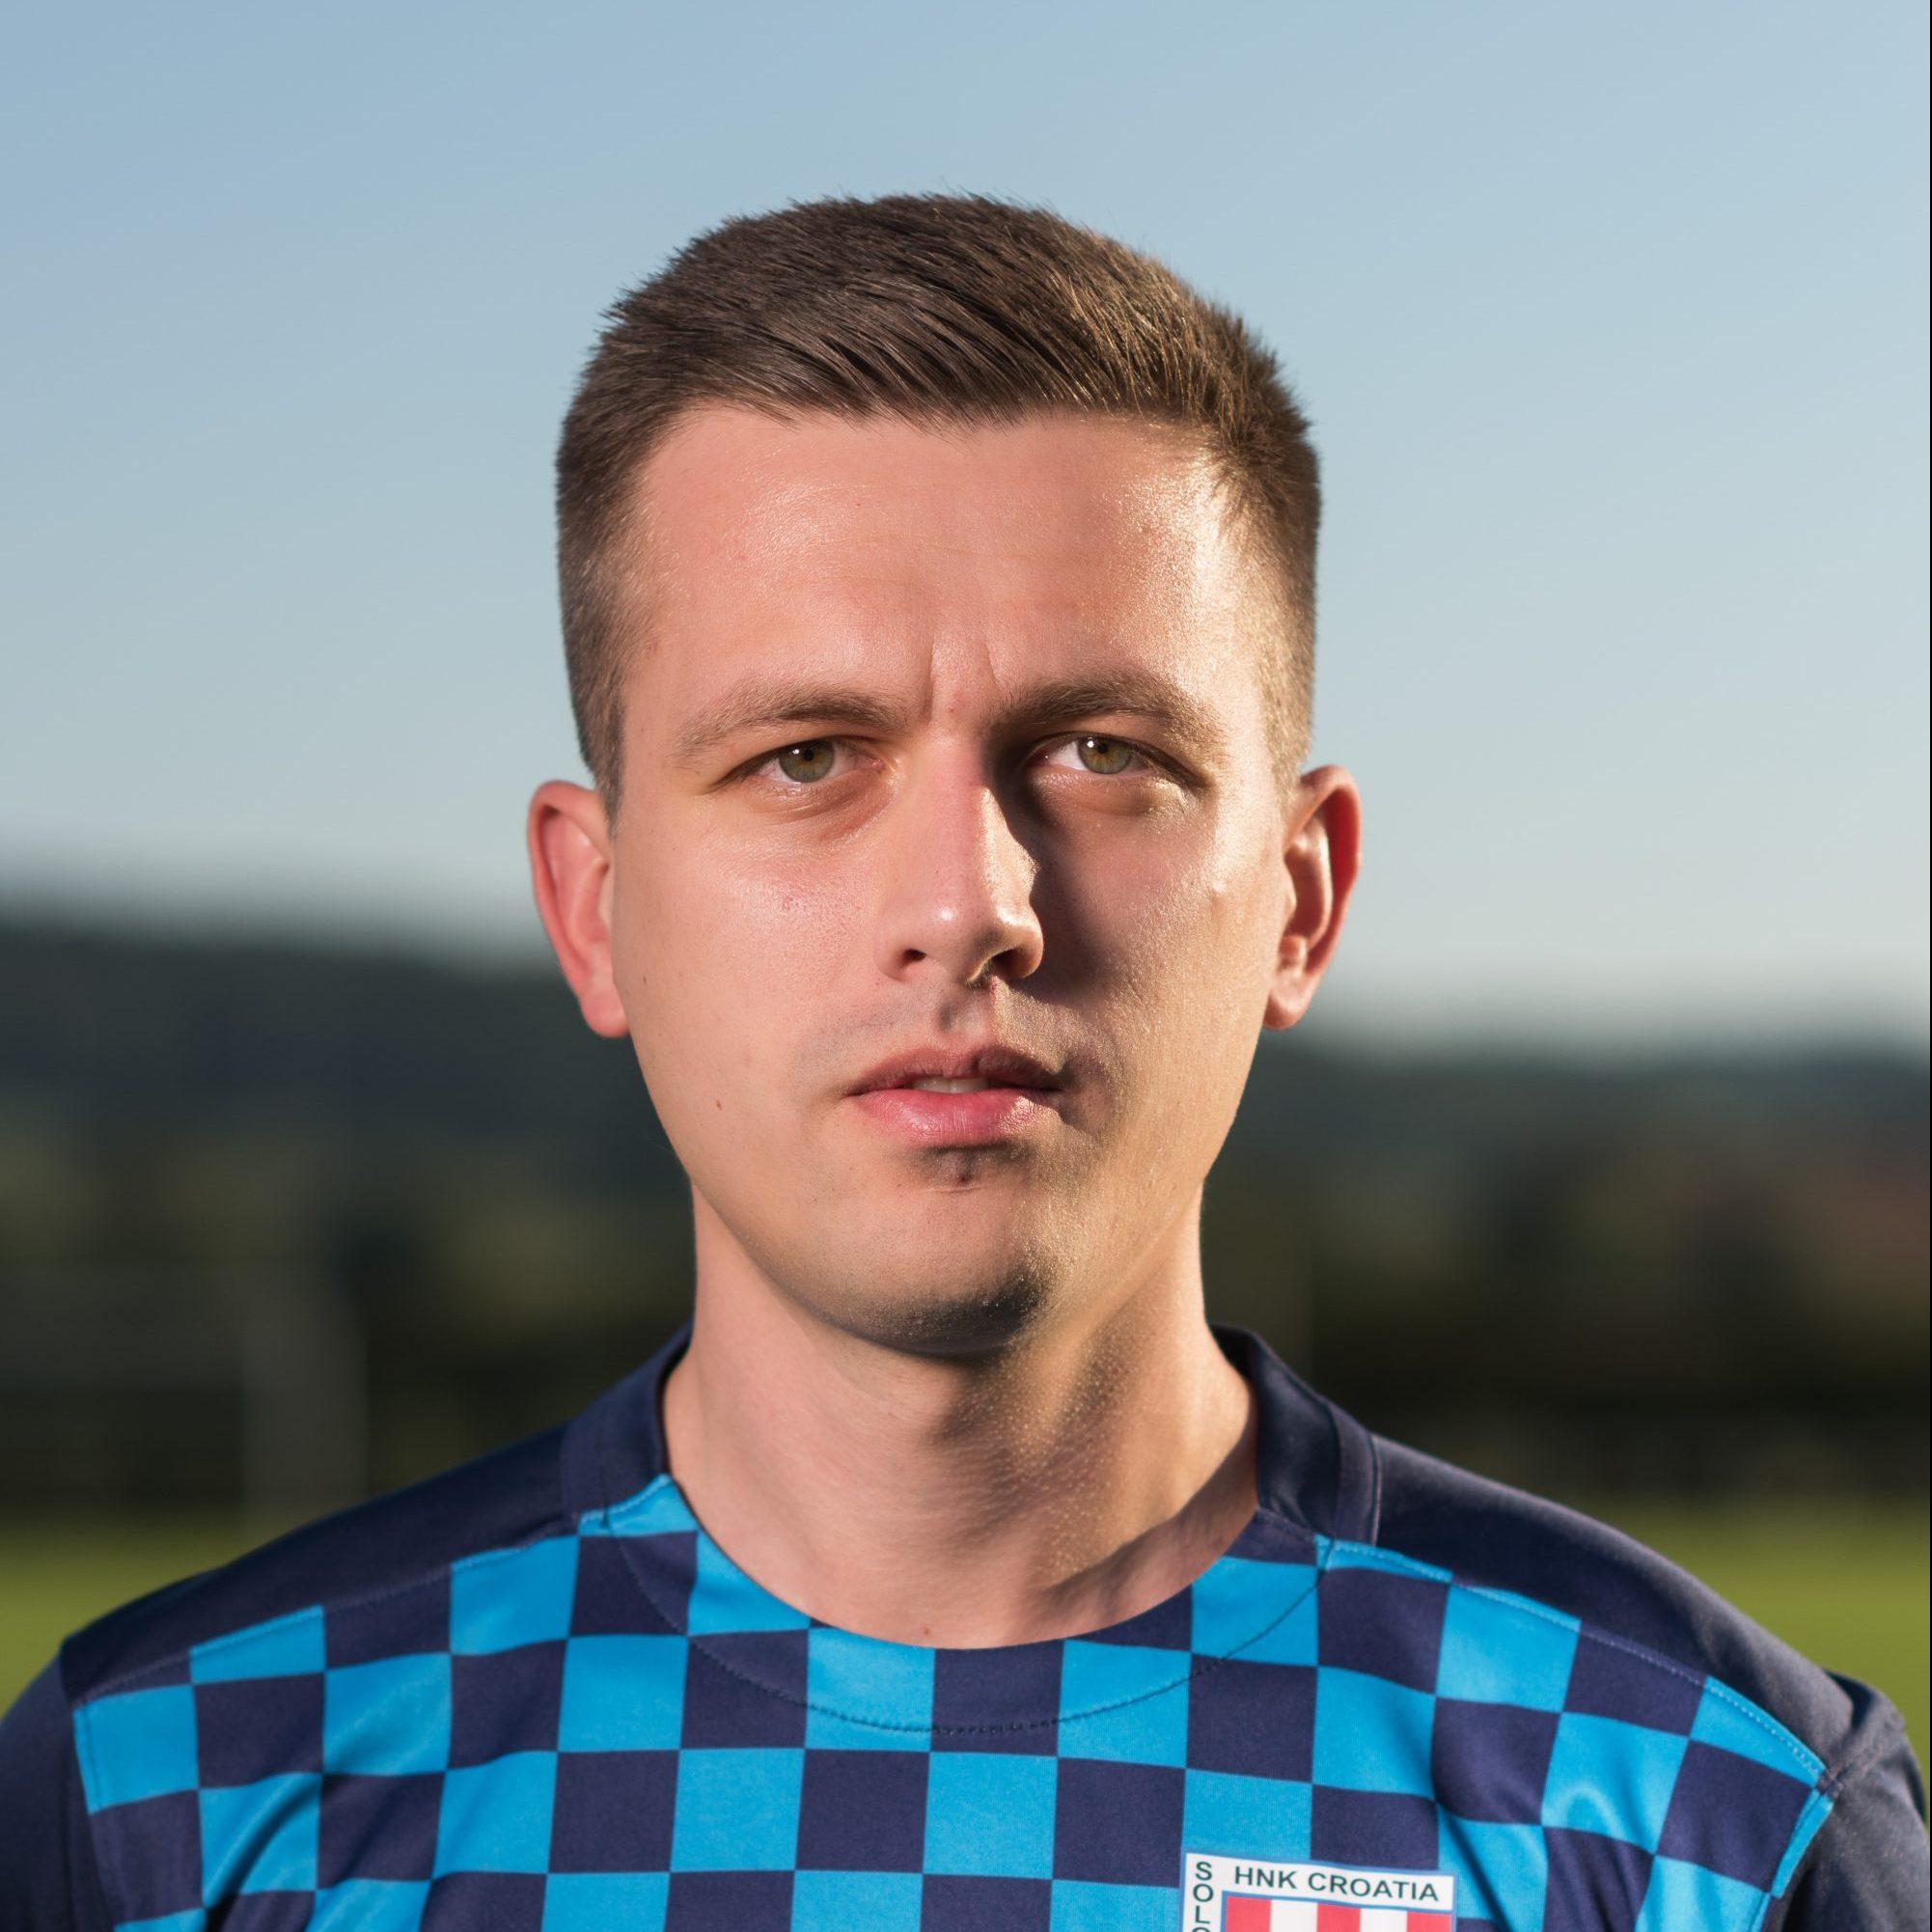 Marko Barukdzic - SPIKO